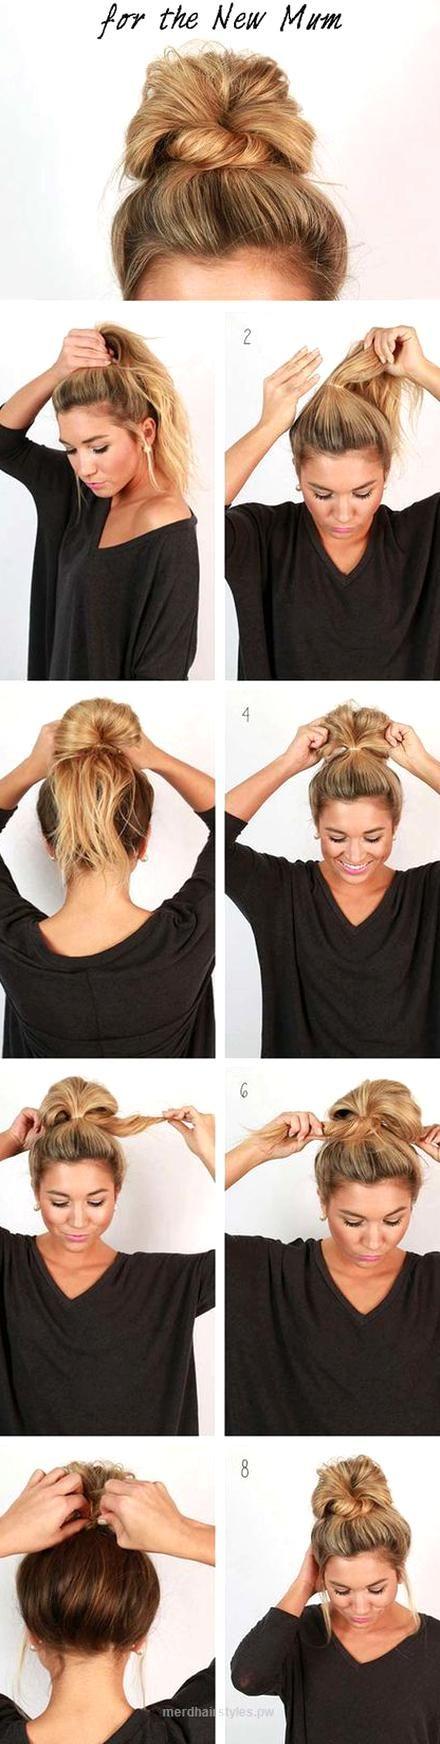 12 Super Easy Hairdos For Those Lazy Days These Super Easy Hairdos Are Perfect When You Have Those Lazy In 2020 Diy Hairstyles Easy Easy Updo Hairstyles Hair Braid Diy